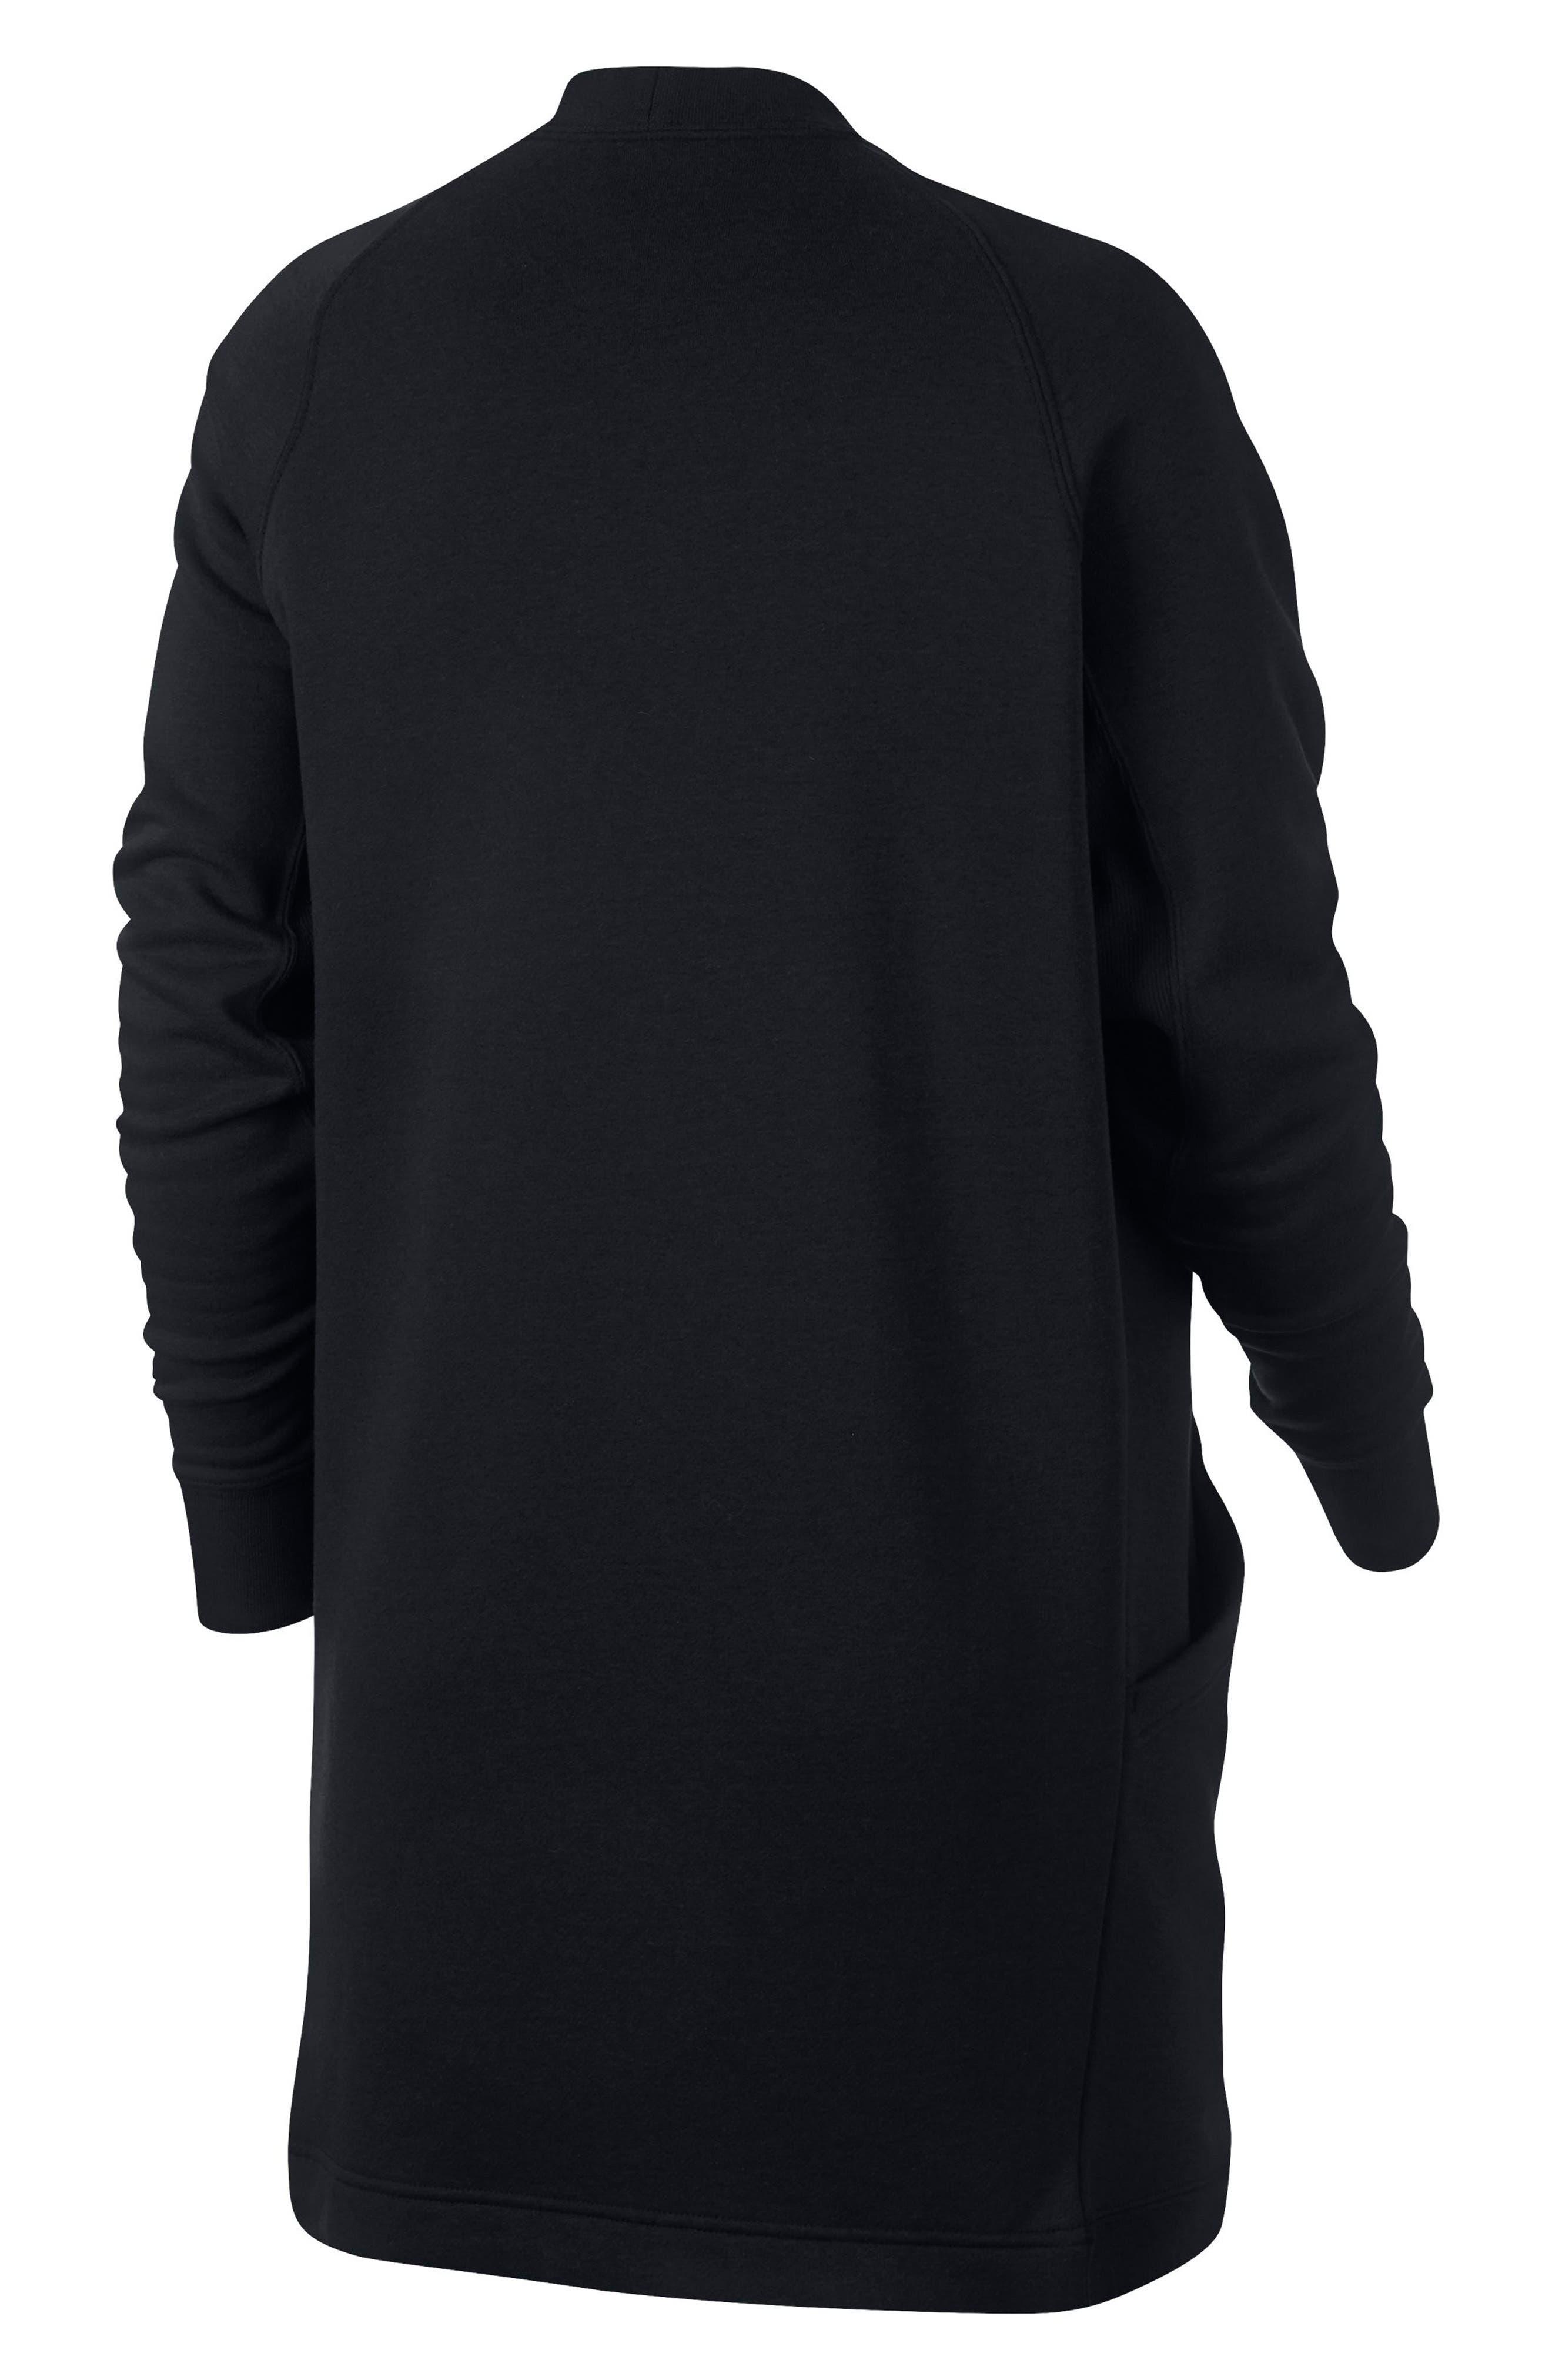 Sportswear Rally Cardigan,                             Alternate thumbnail 6, color,                             BLACK/ BLACK/ WHITE